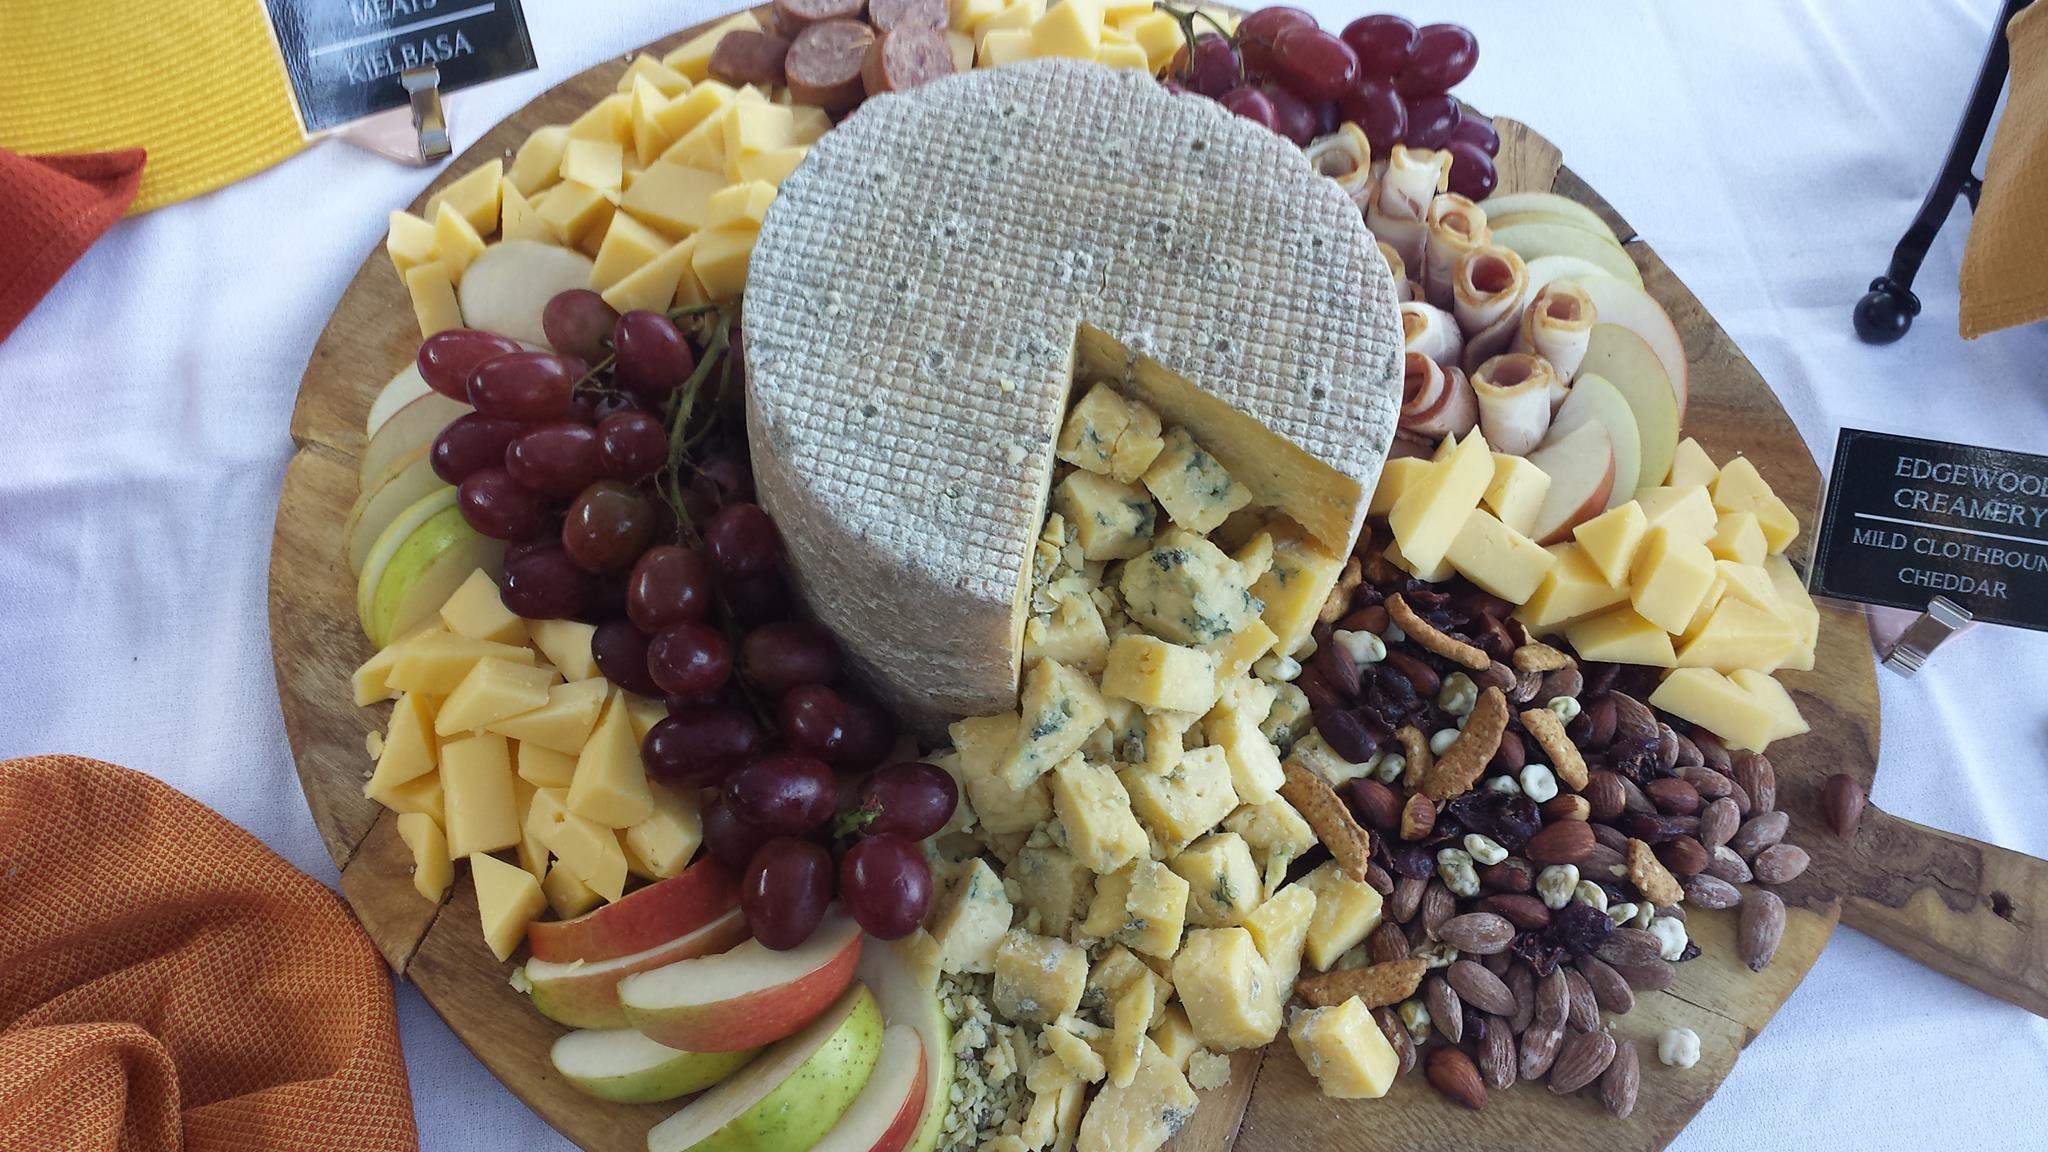 cheese night at terrell creek farm